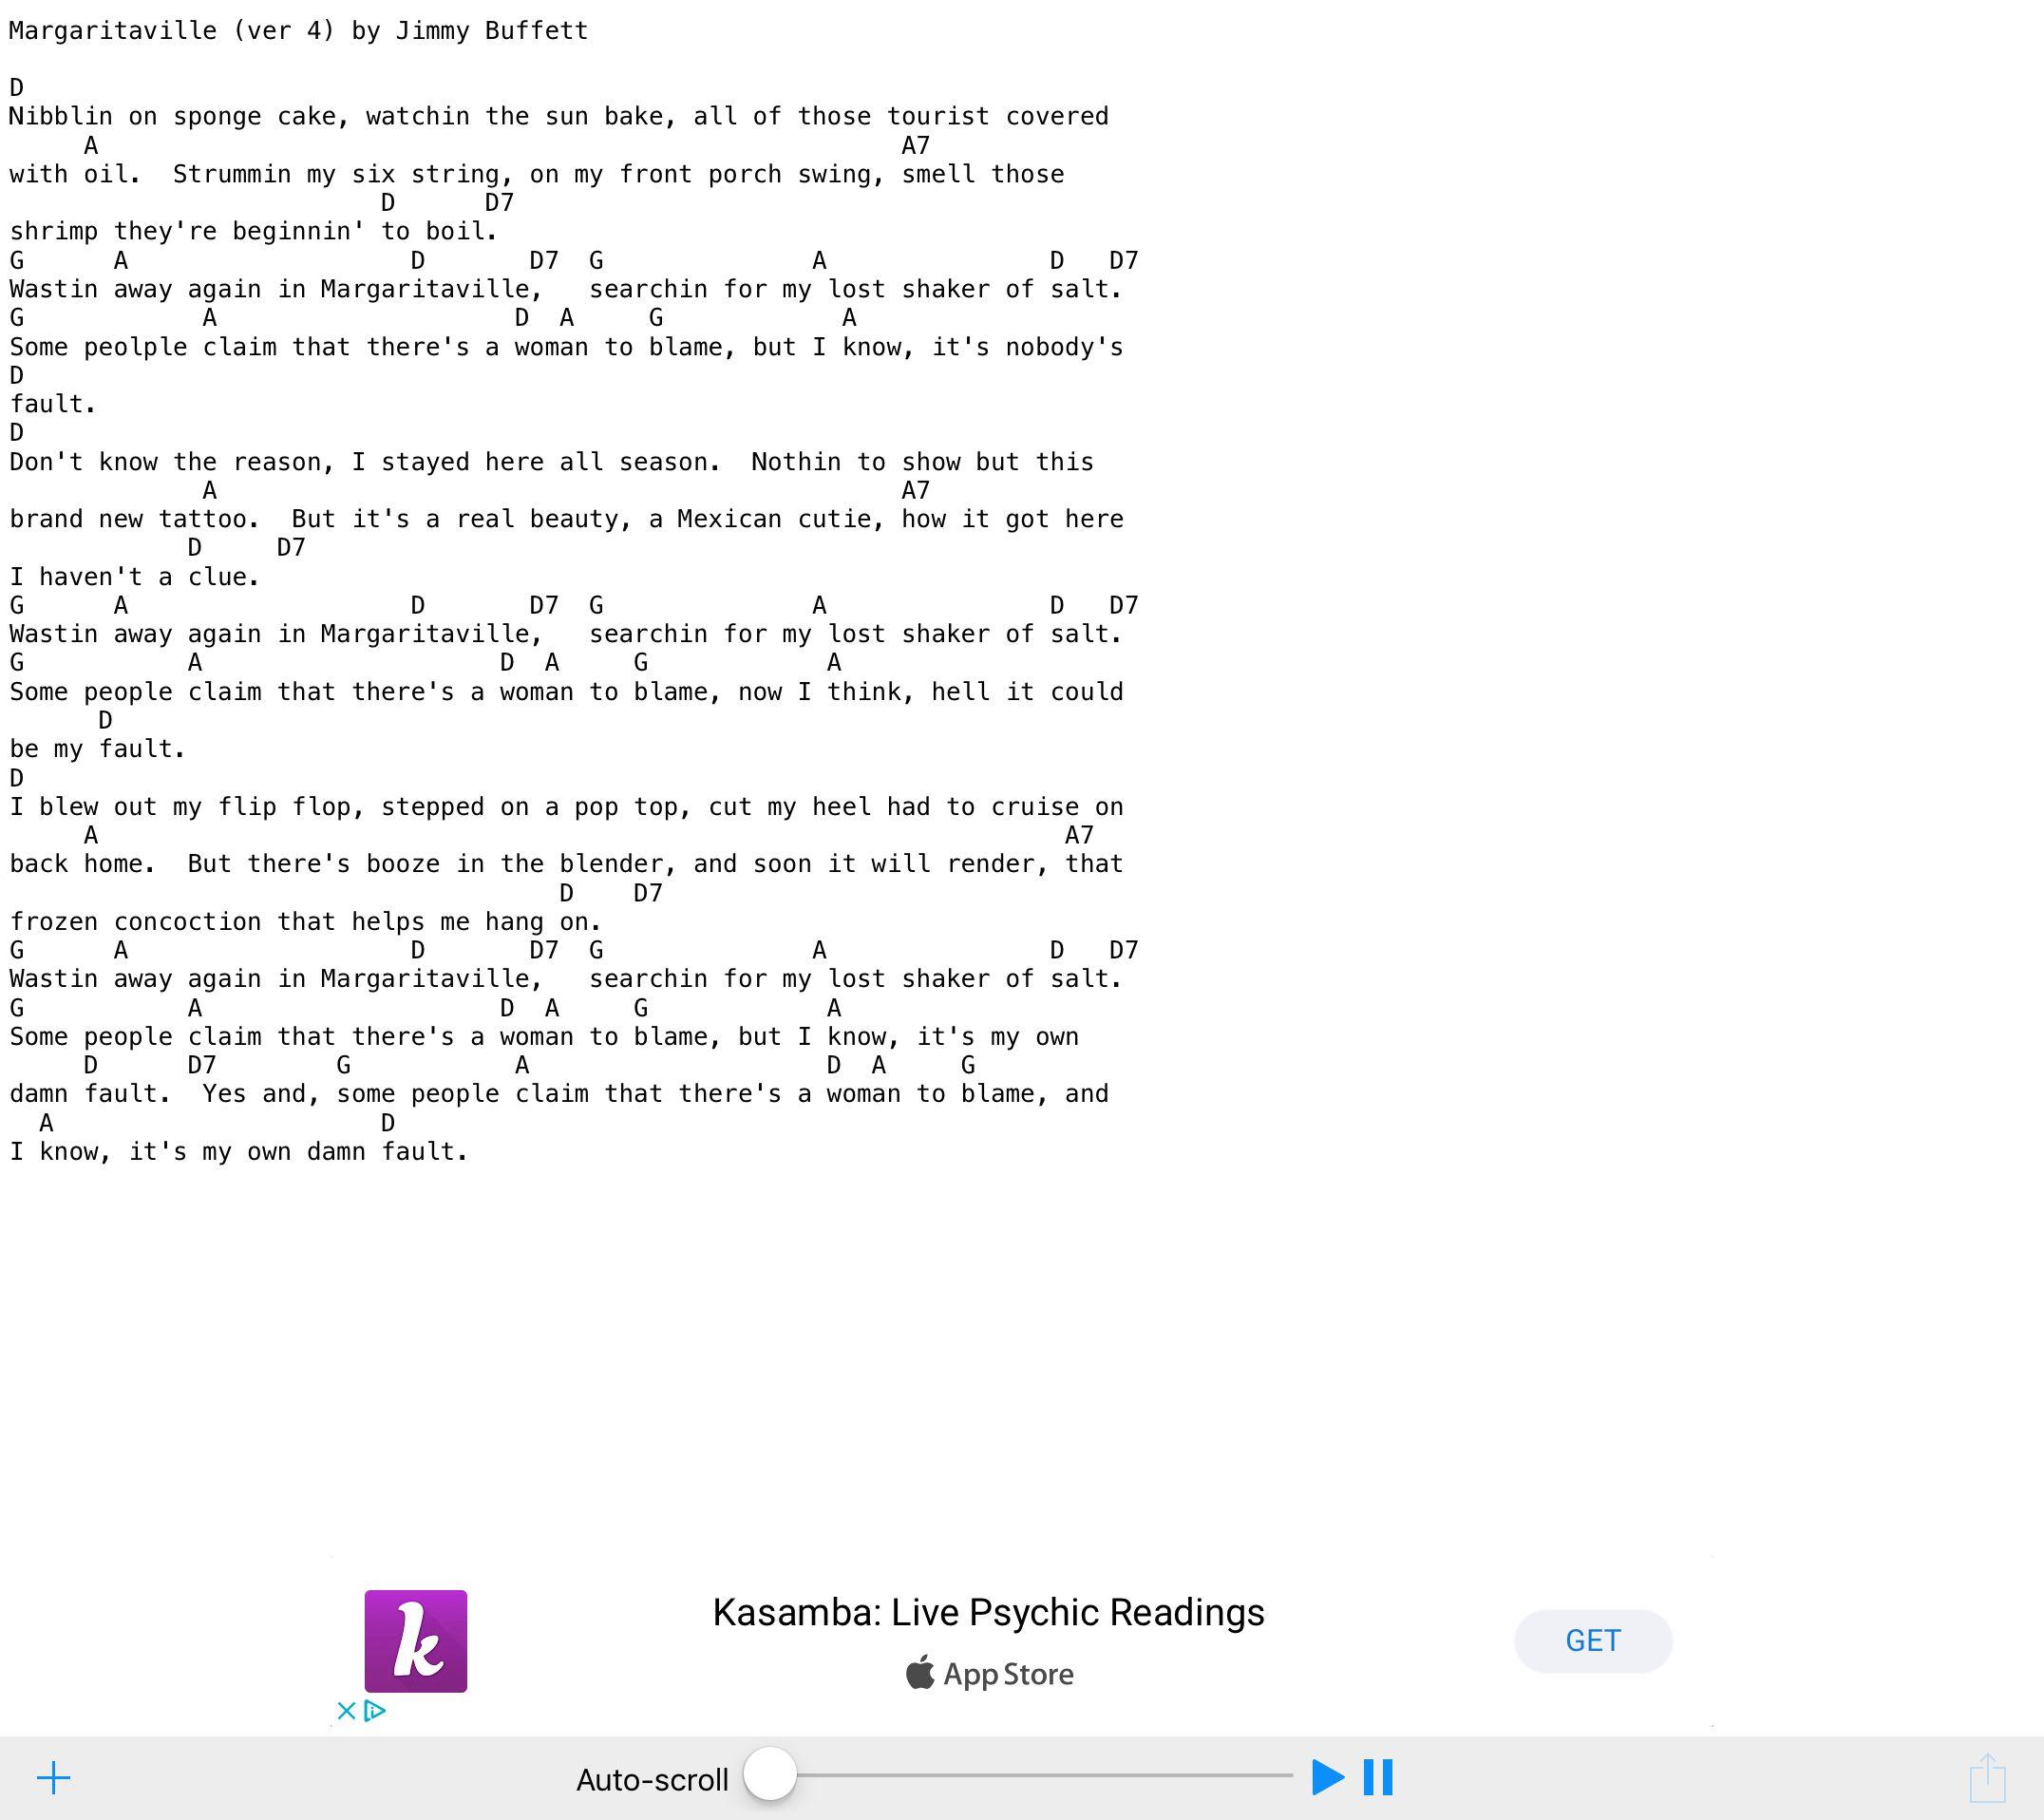 Jimmy buffett margaritaville guitar chords gallery guitar chords im playing margaritaville ver 4 by jimmy buffett using im playing margaritaville ver 4 by jimmy hexwebz Gallery